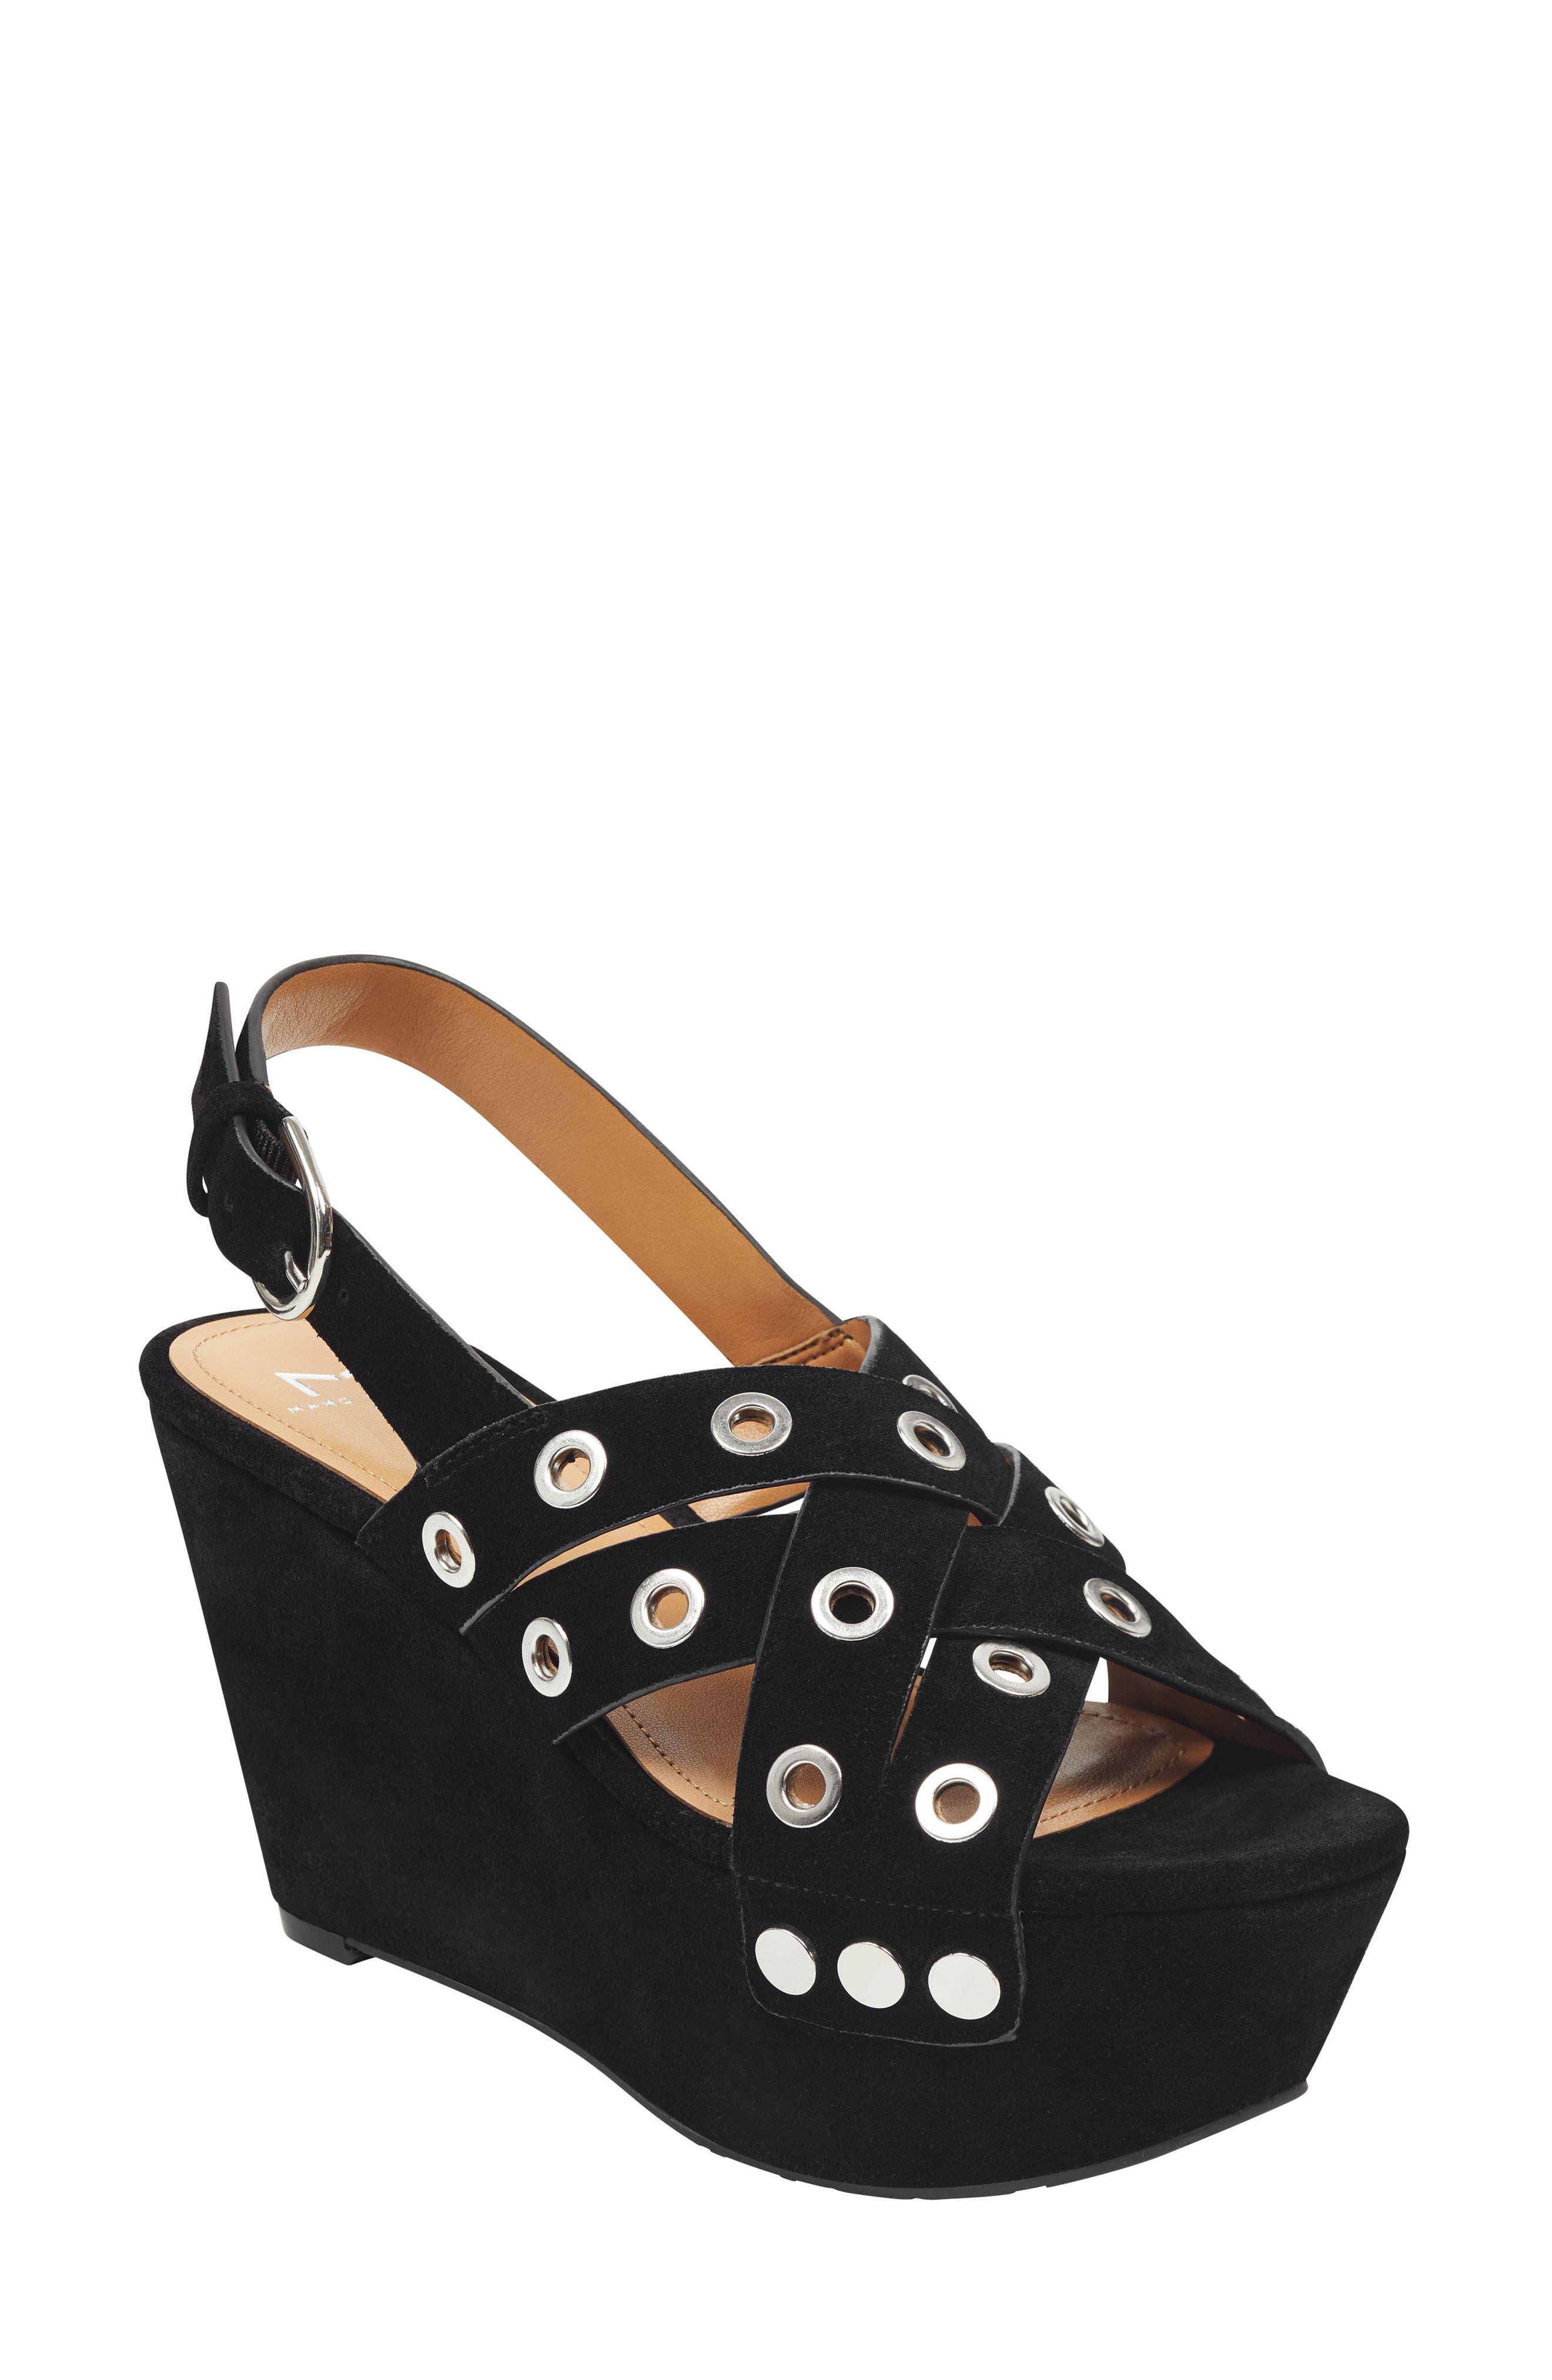 Bloom Platform Sandal,                             Main thumbnail 1, color,                             BLACK SUEDE